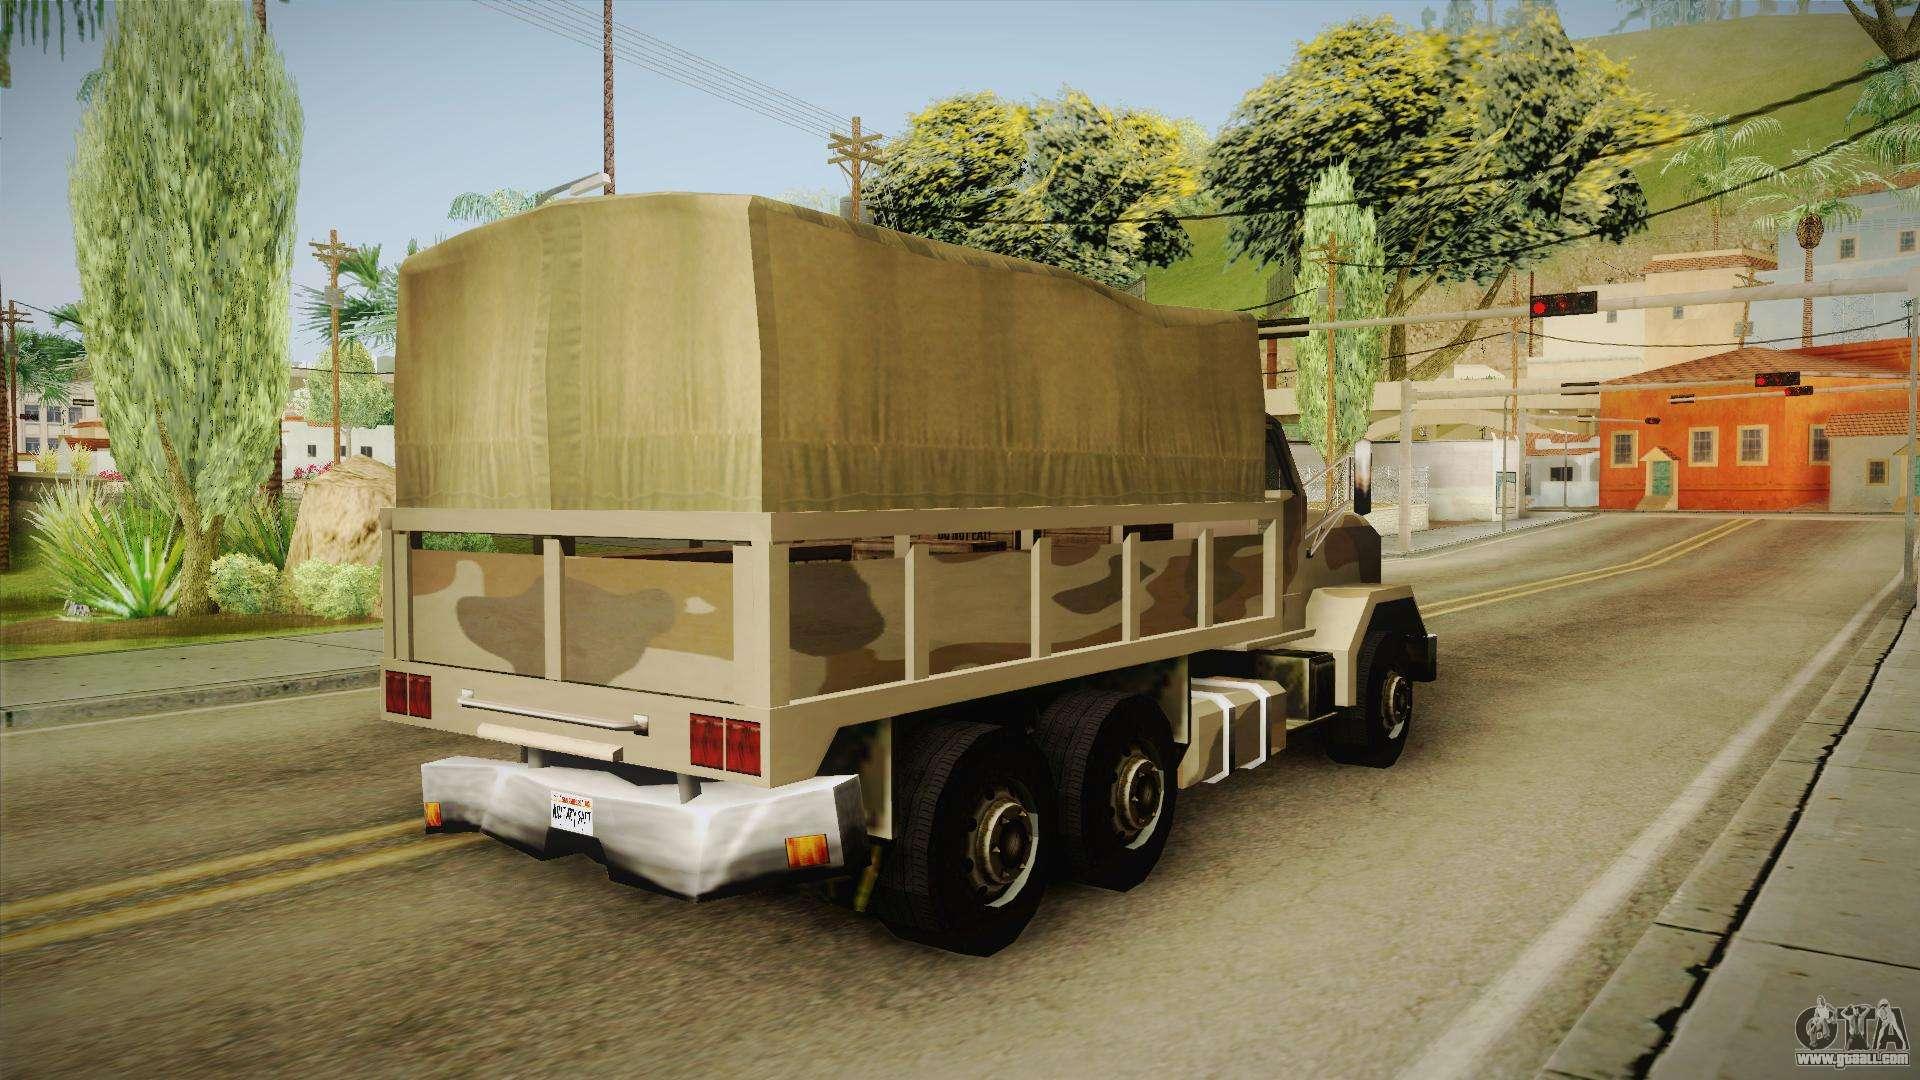 Armoured Vehicles Latin America ⁓ These Gta San Andreas Car